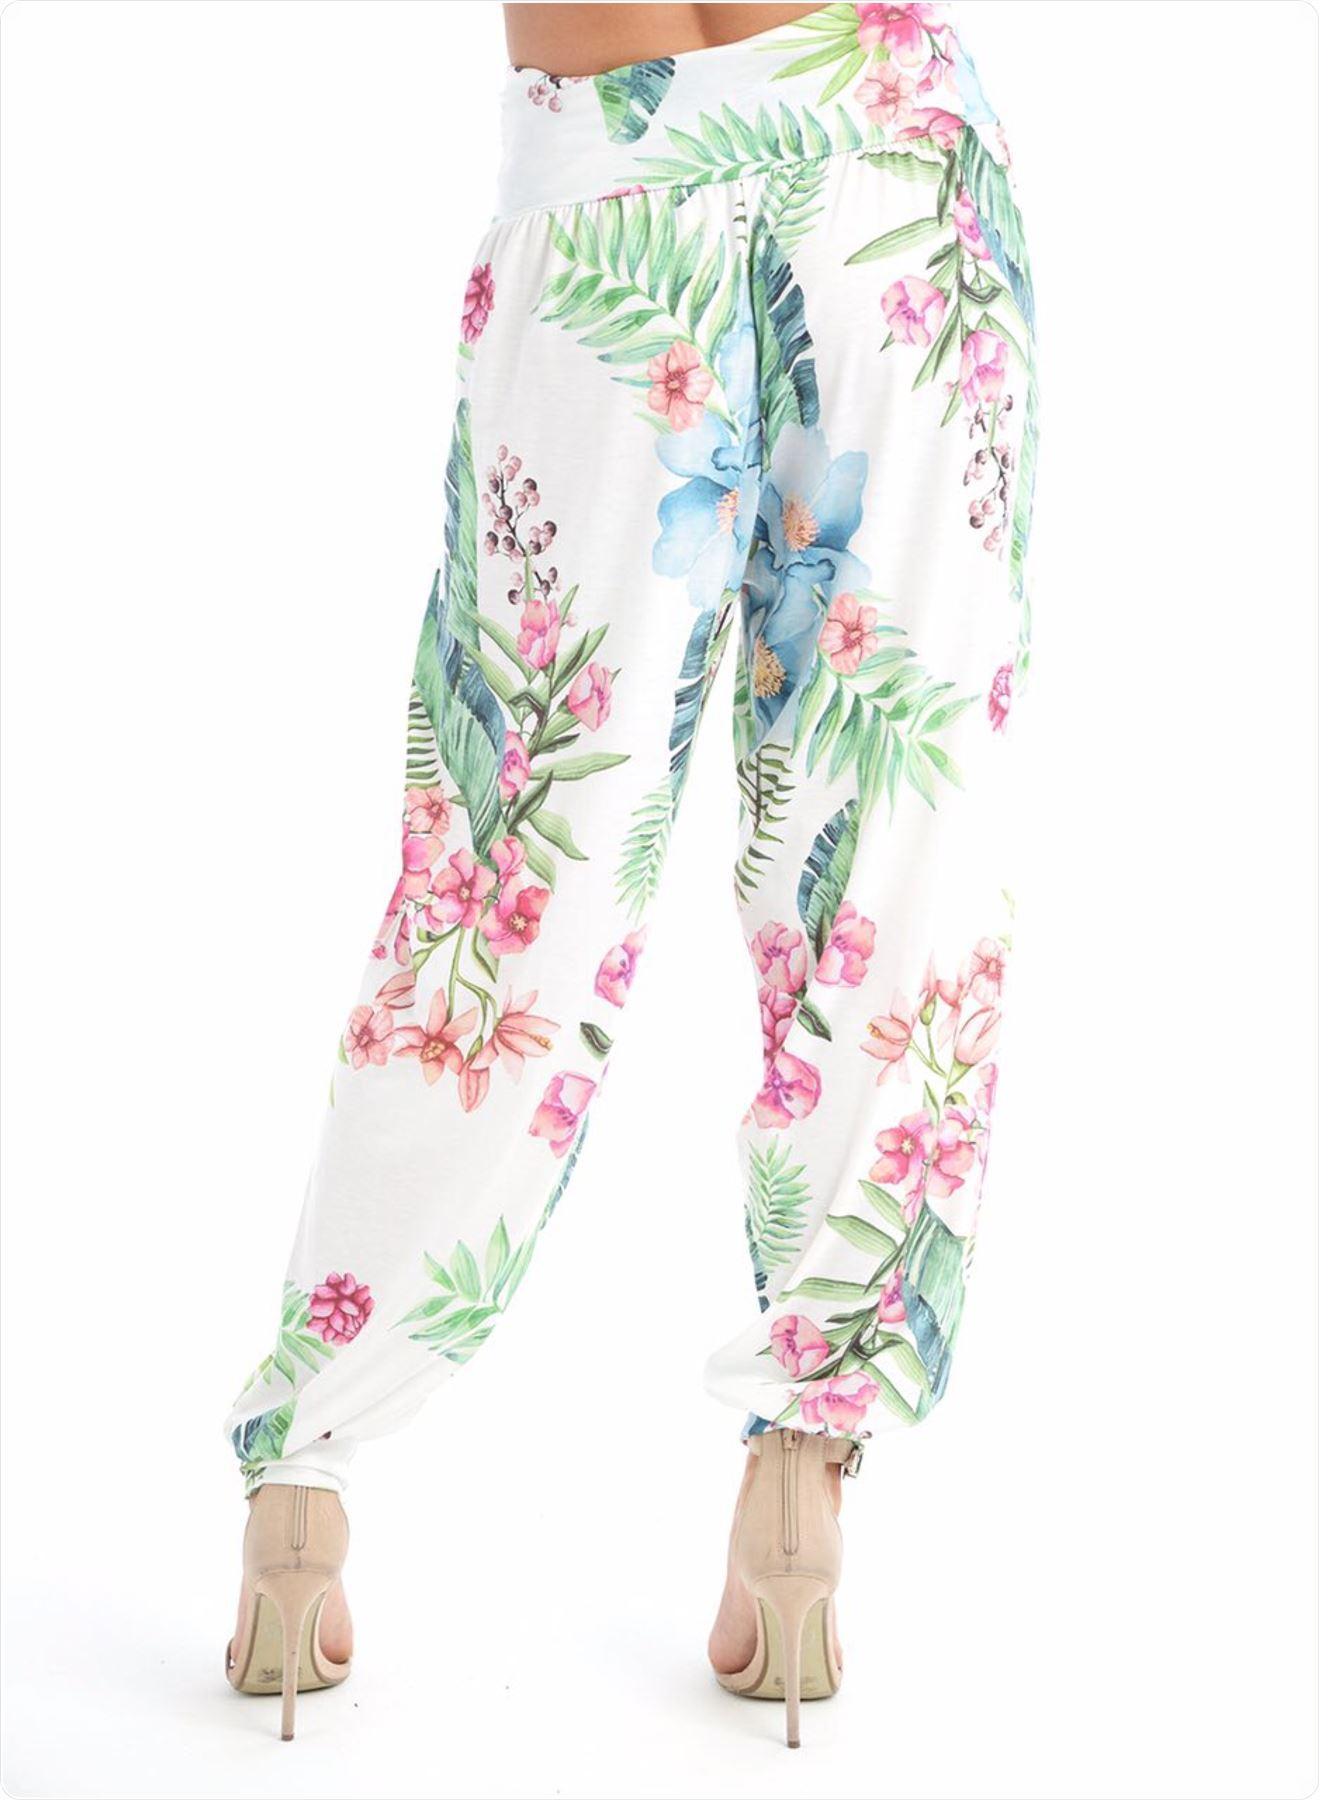 New Womens Ladies Printed Cuffed Bottom Ali Baba Harem Baggy Trousers Leggings